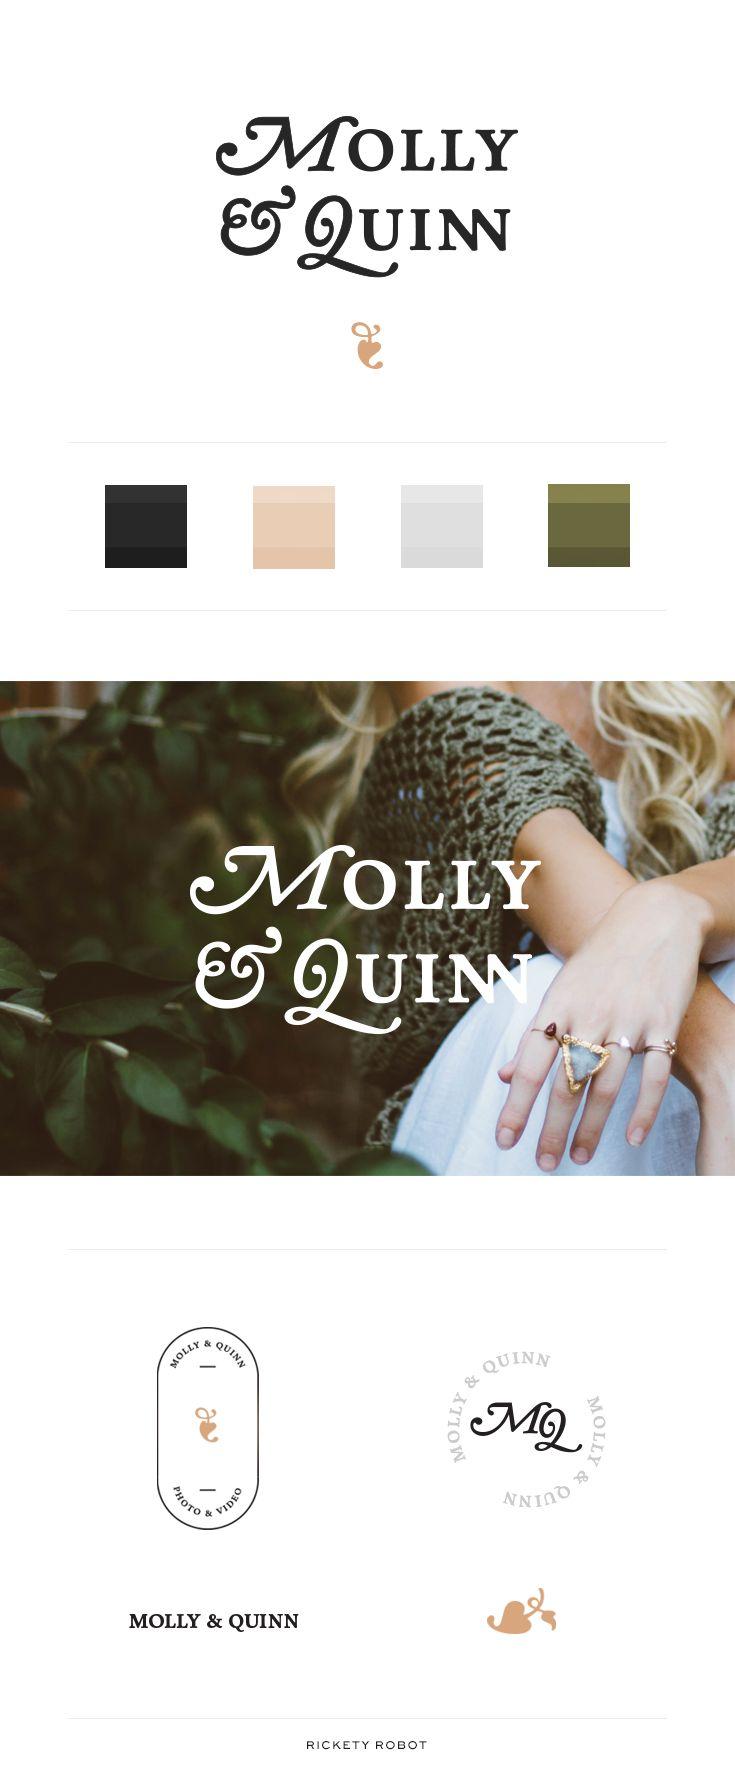 Molly & Quinn - Conceptual Photographer Branding - Designed by Rickety Robot